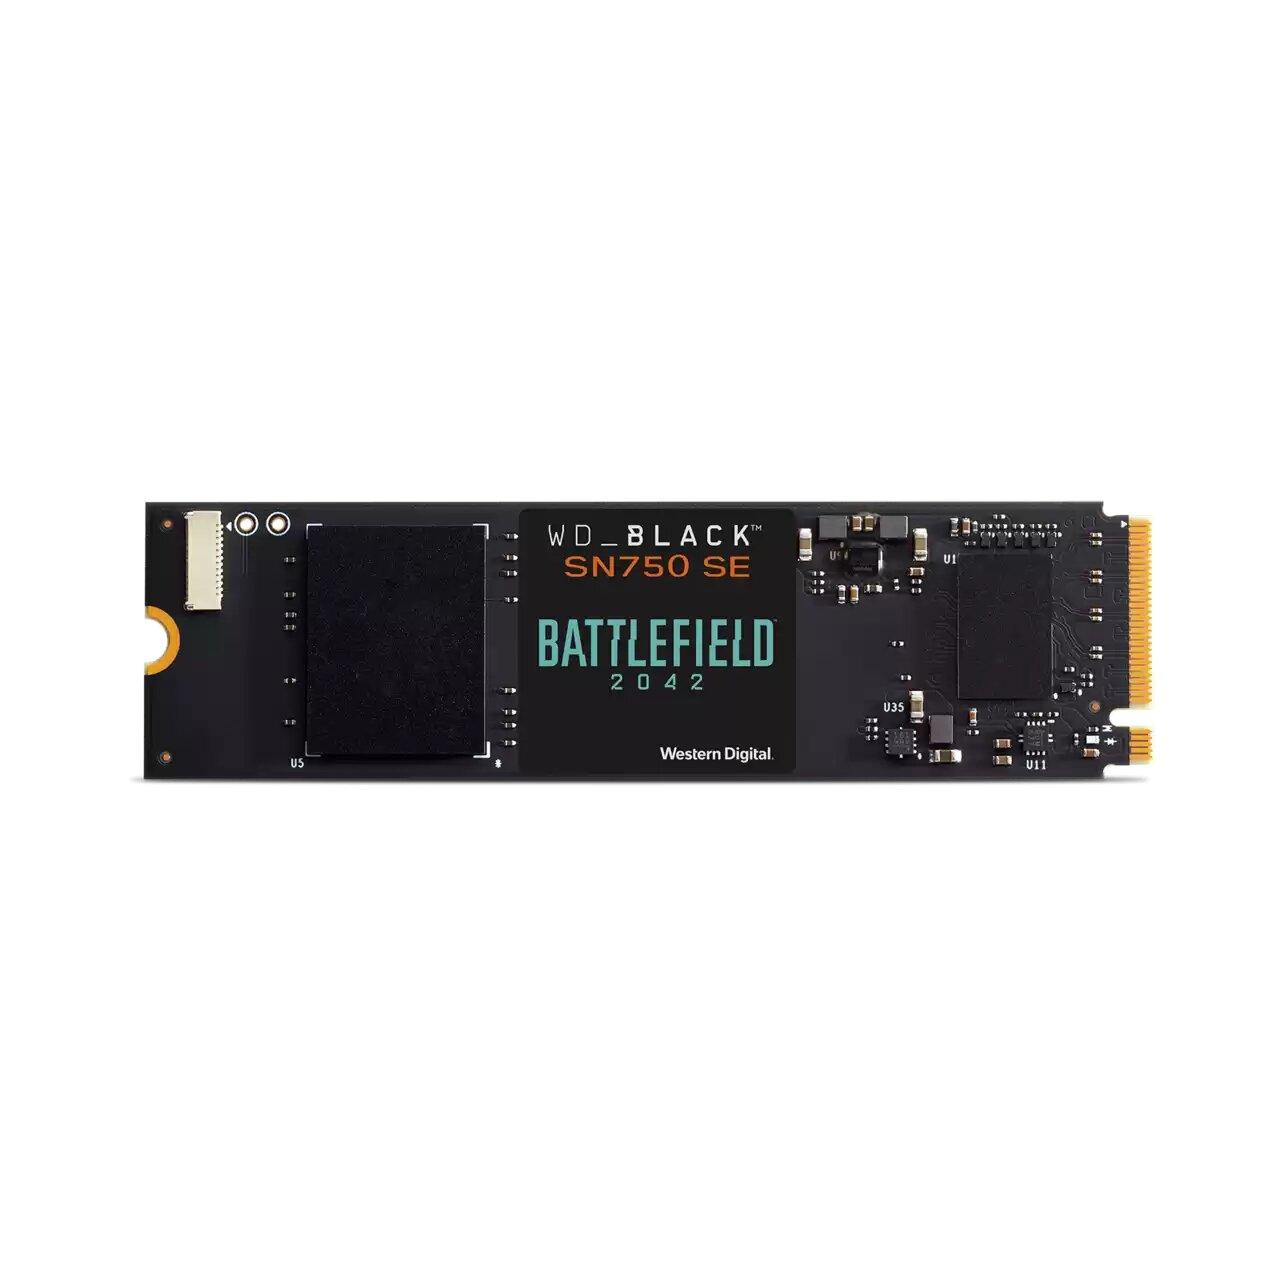 SanDisk SN750 SE M.2 1000 GB PCI Express 4.0 NVMe